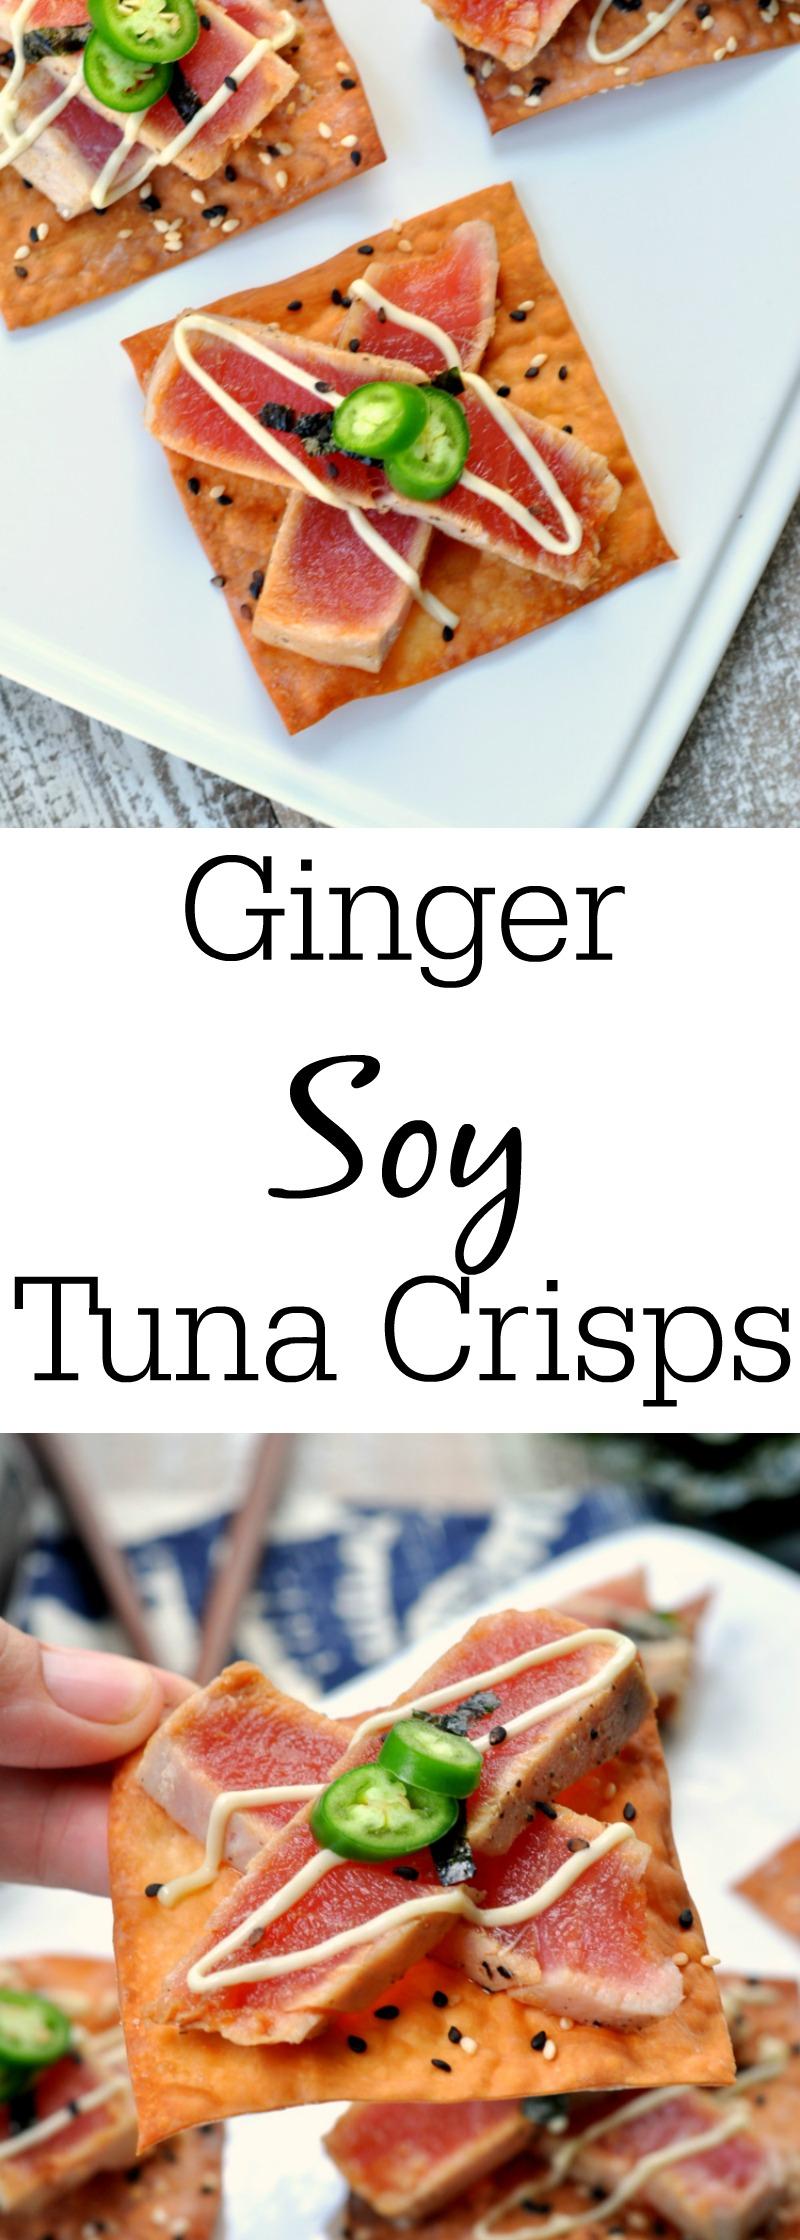 Ginger Soy Tuna Crisps